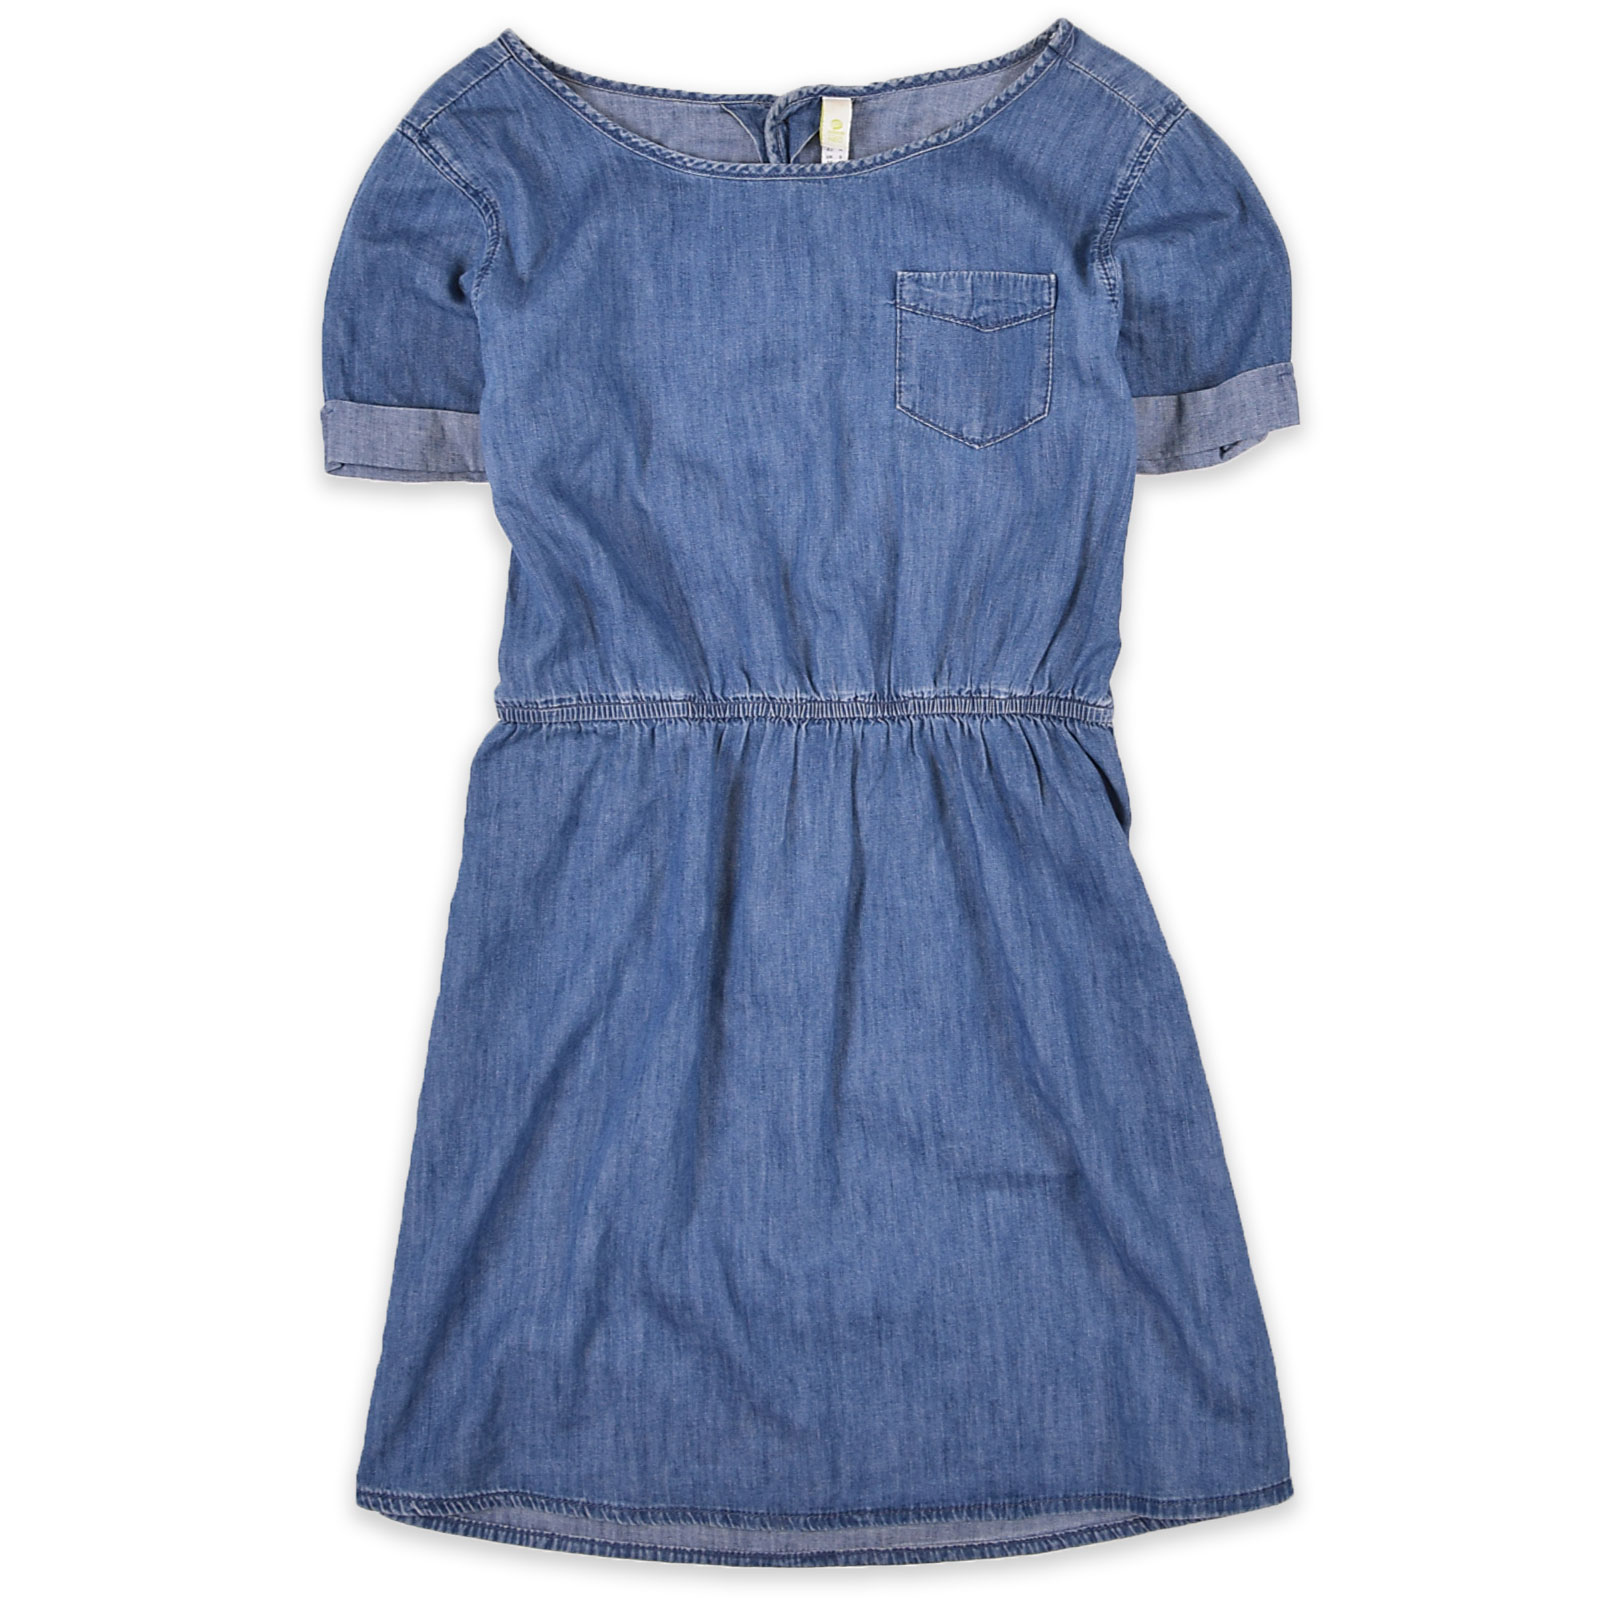 Adidas Damen Kleid Dress A-Linie-Kleid Gr.40 Neo Label ...